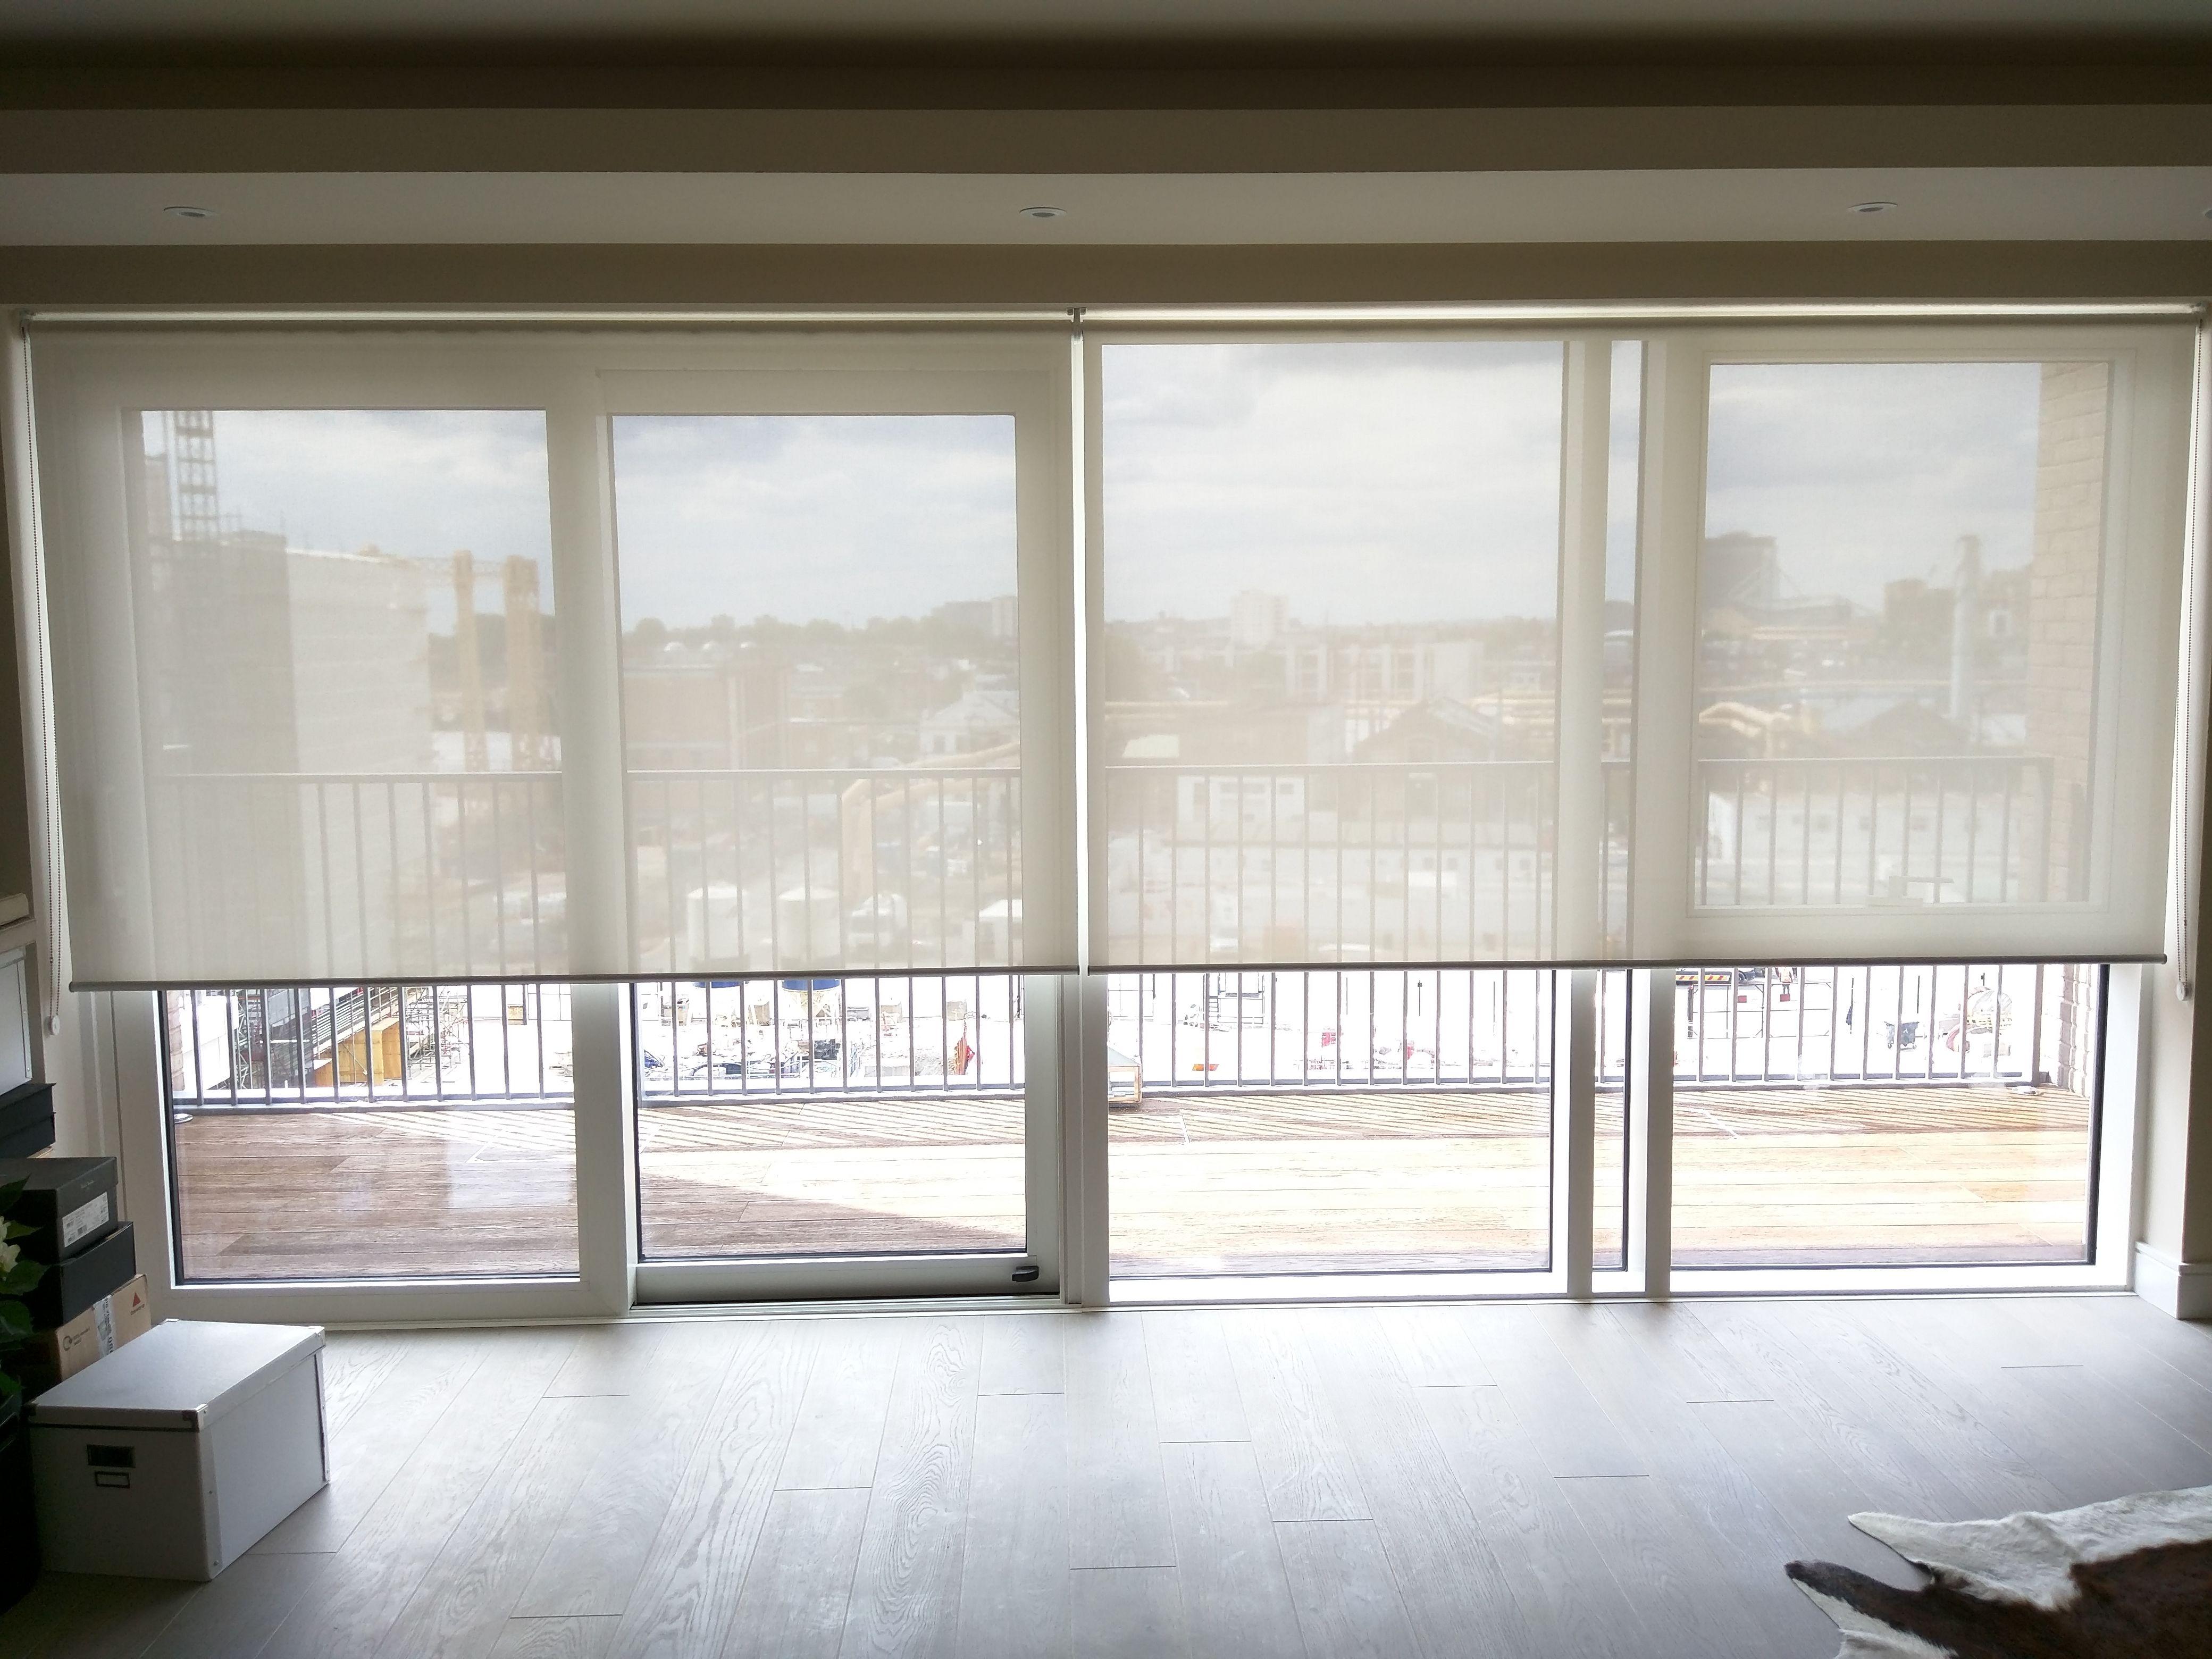 Vertical blinds enhance sliding doors and larger windows into stylish - Sunscreen Roller Blinds Floor To Ceiling Windows Sliding Doors